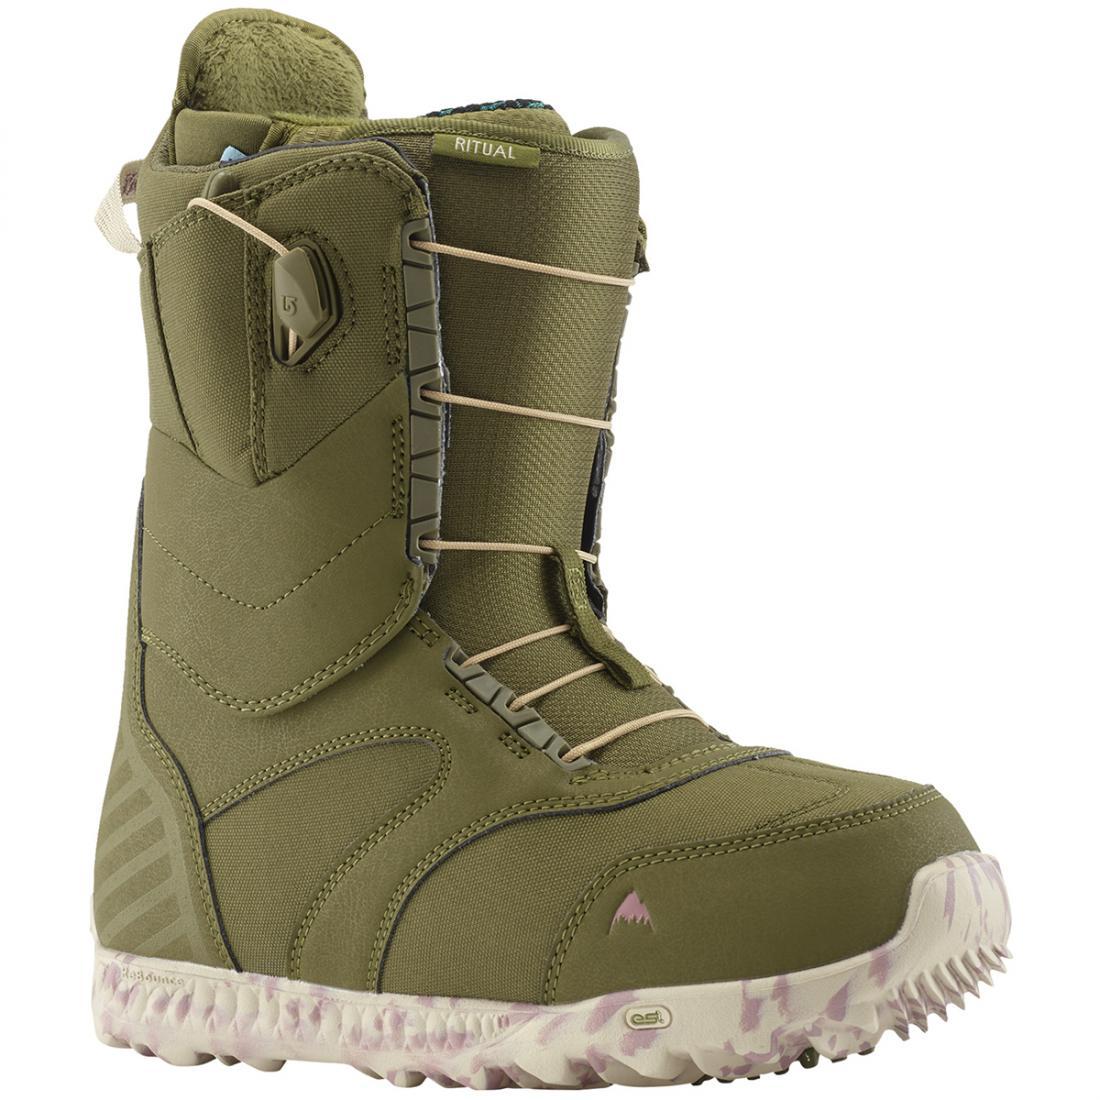 Ботинки для сноуборда Burton Ritual купить в Boardshop №1